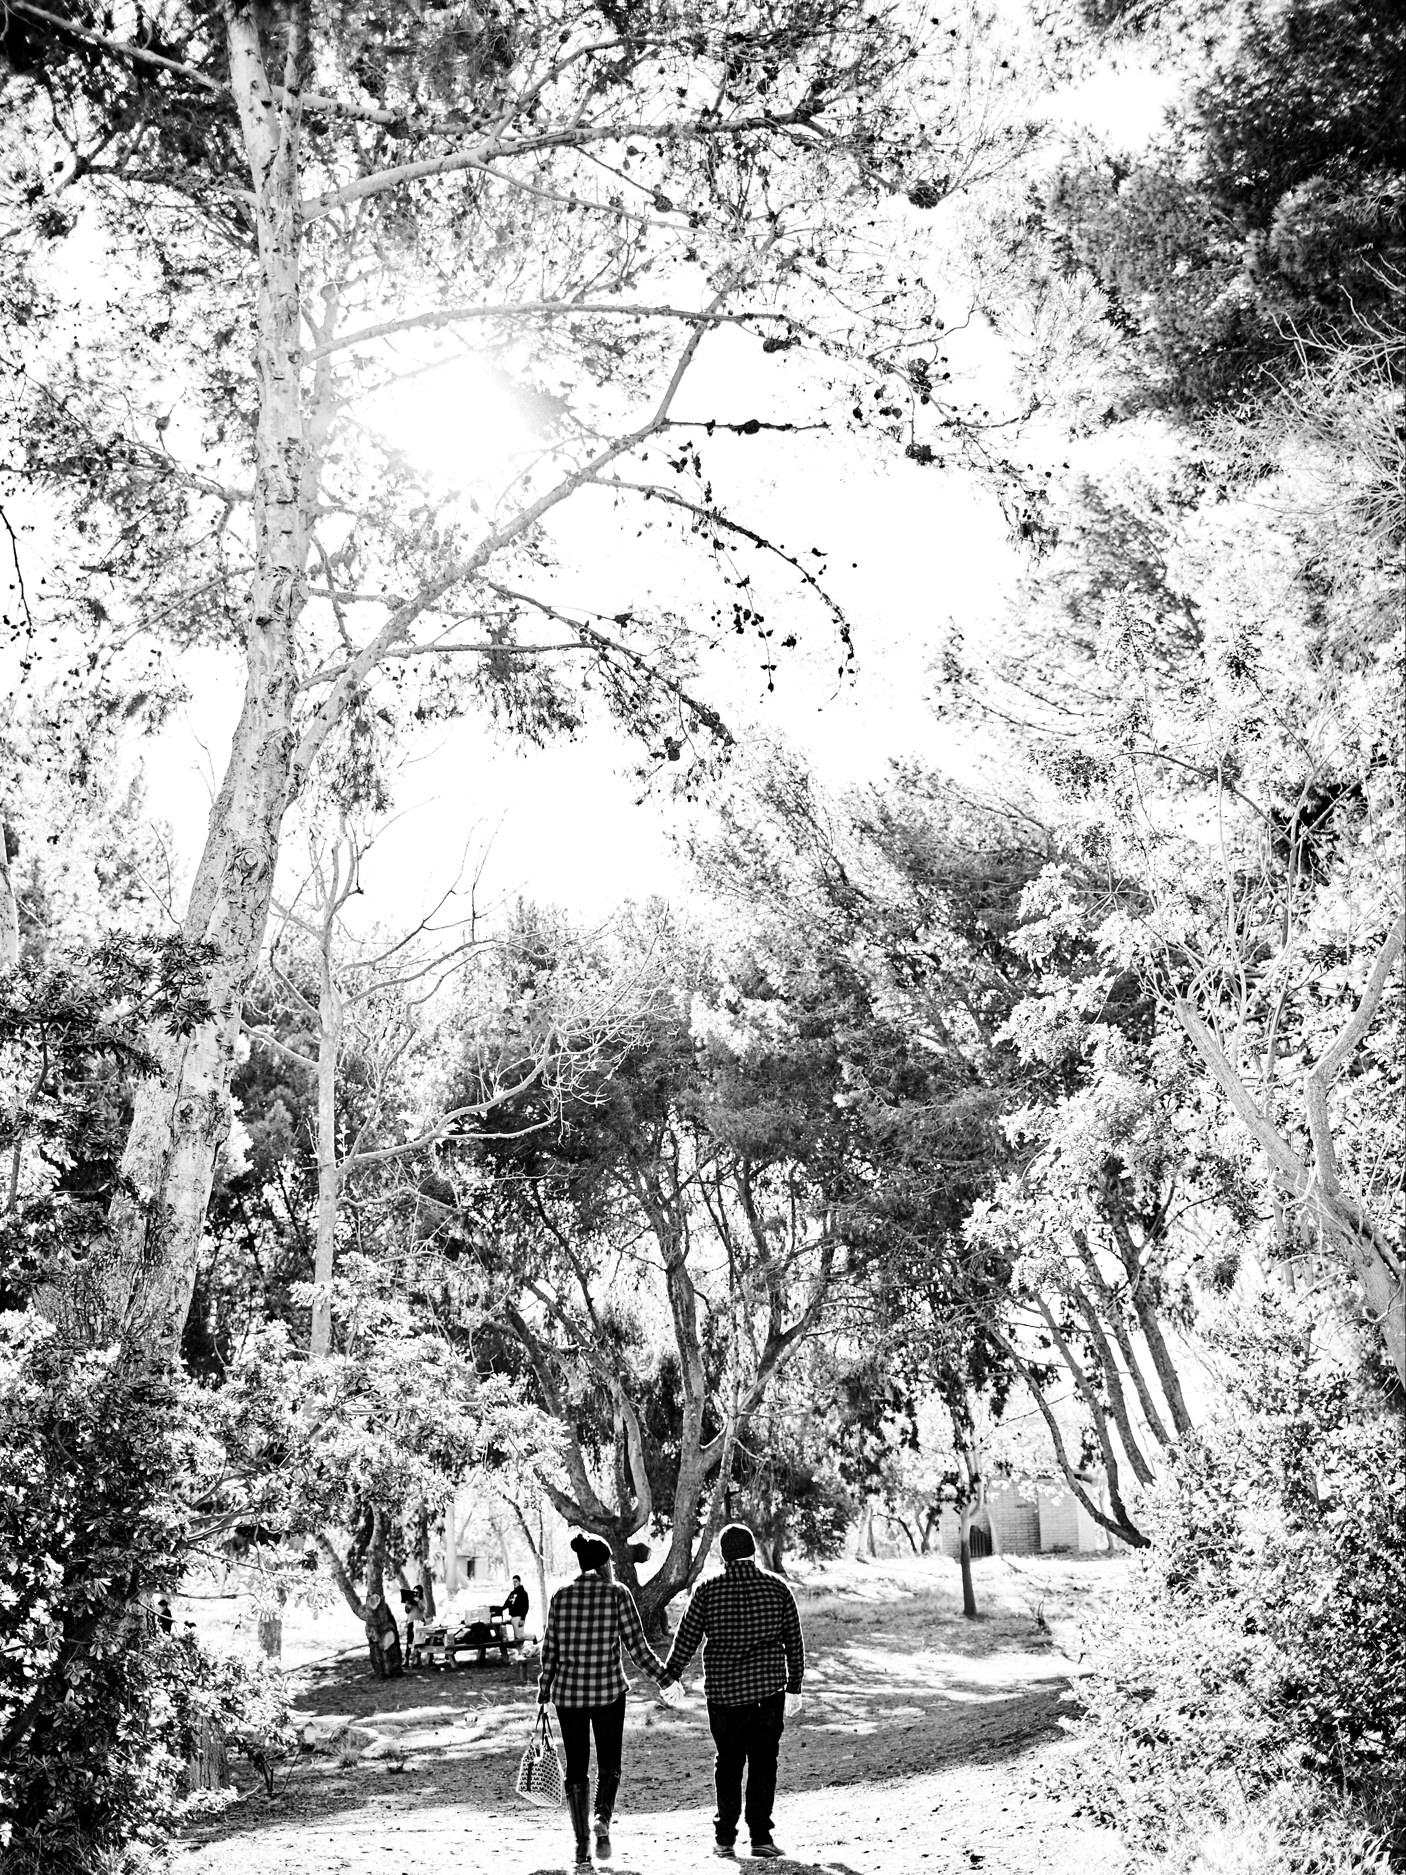 Wilderness Park Redondo Beach Engagement Photographs and Wilderness Park Redondo Beach Engagement Photography, Wilderness Park Redondo Beach Engagement Photographer, Wilderness Park Redondo Beach Engagement Photos from Fine Art Family Portrait Photographer, engagement photographer and Wedding Photographer Daniel Doty Photography.